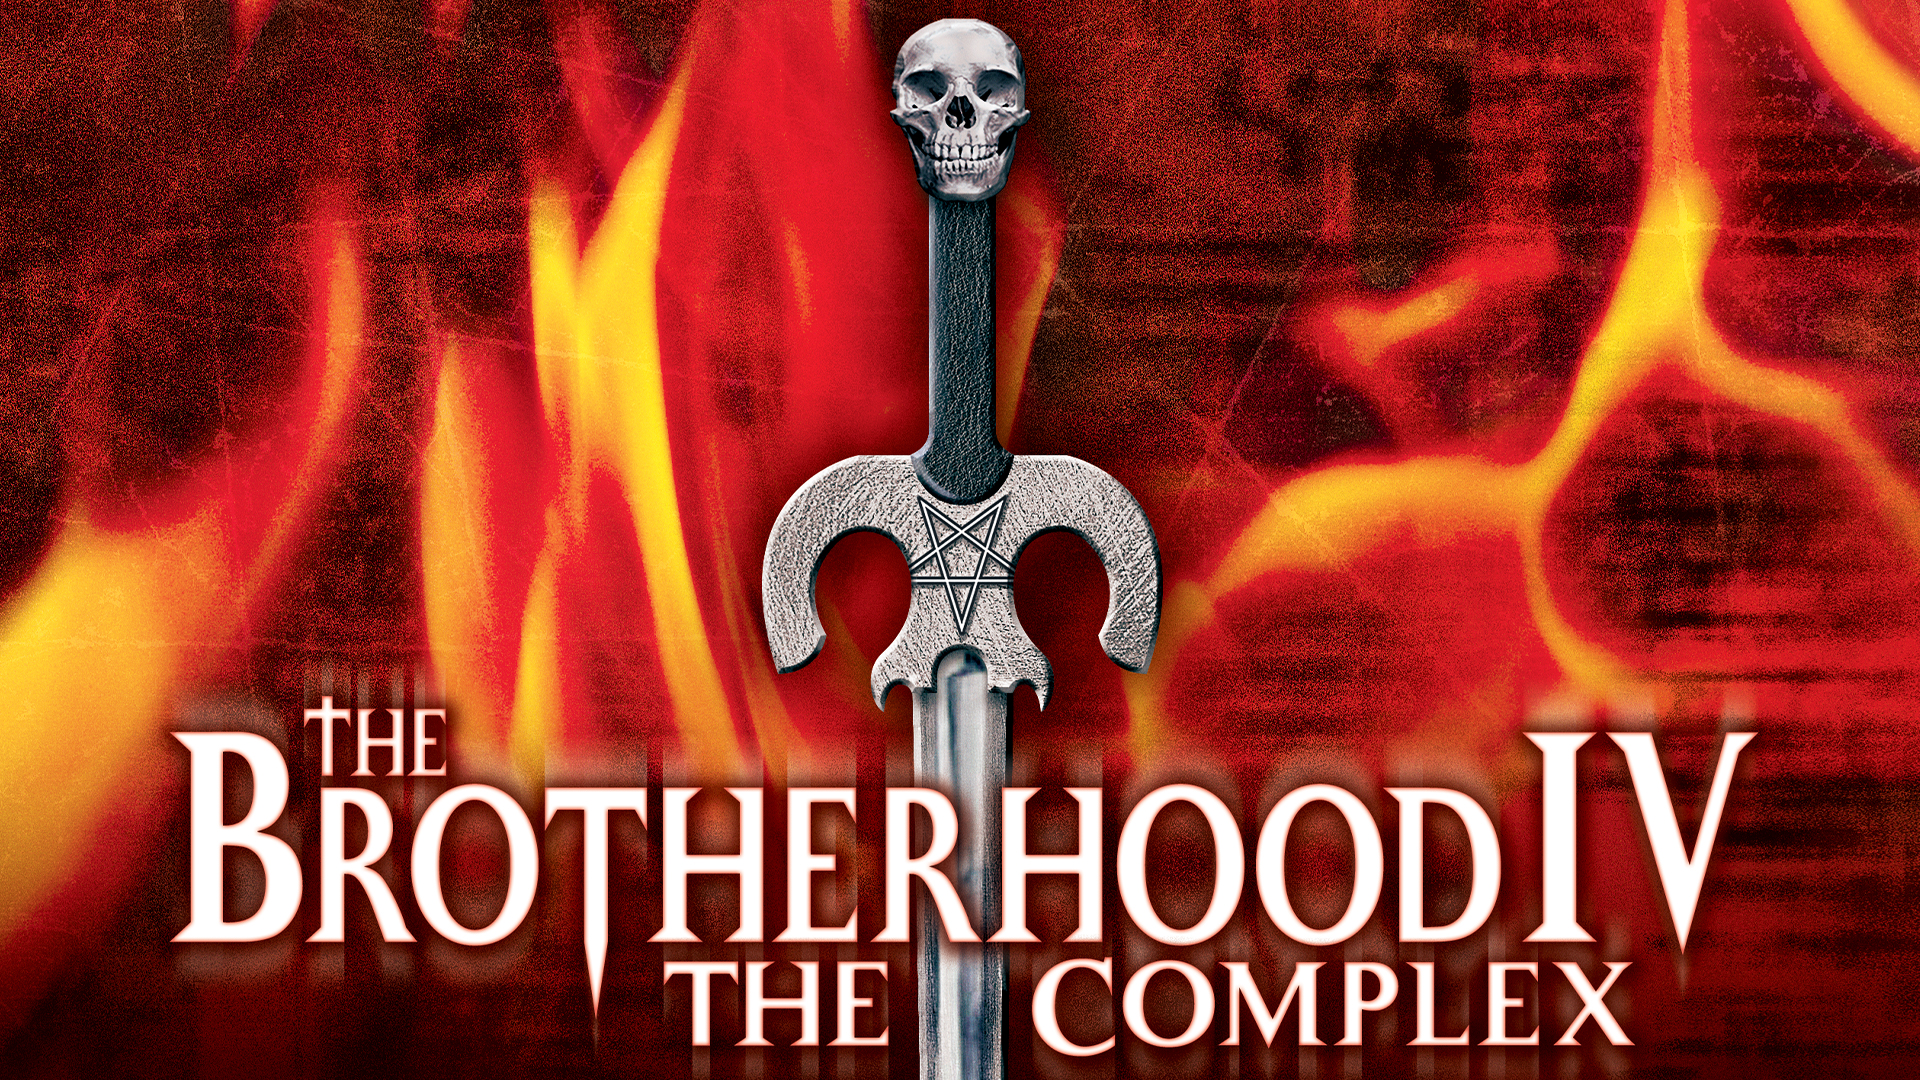 The Brotherhood IV: The Complex